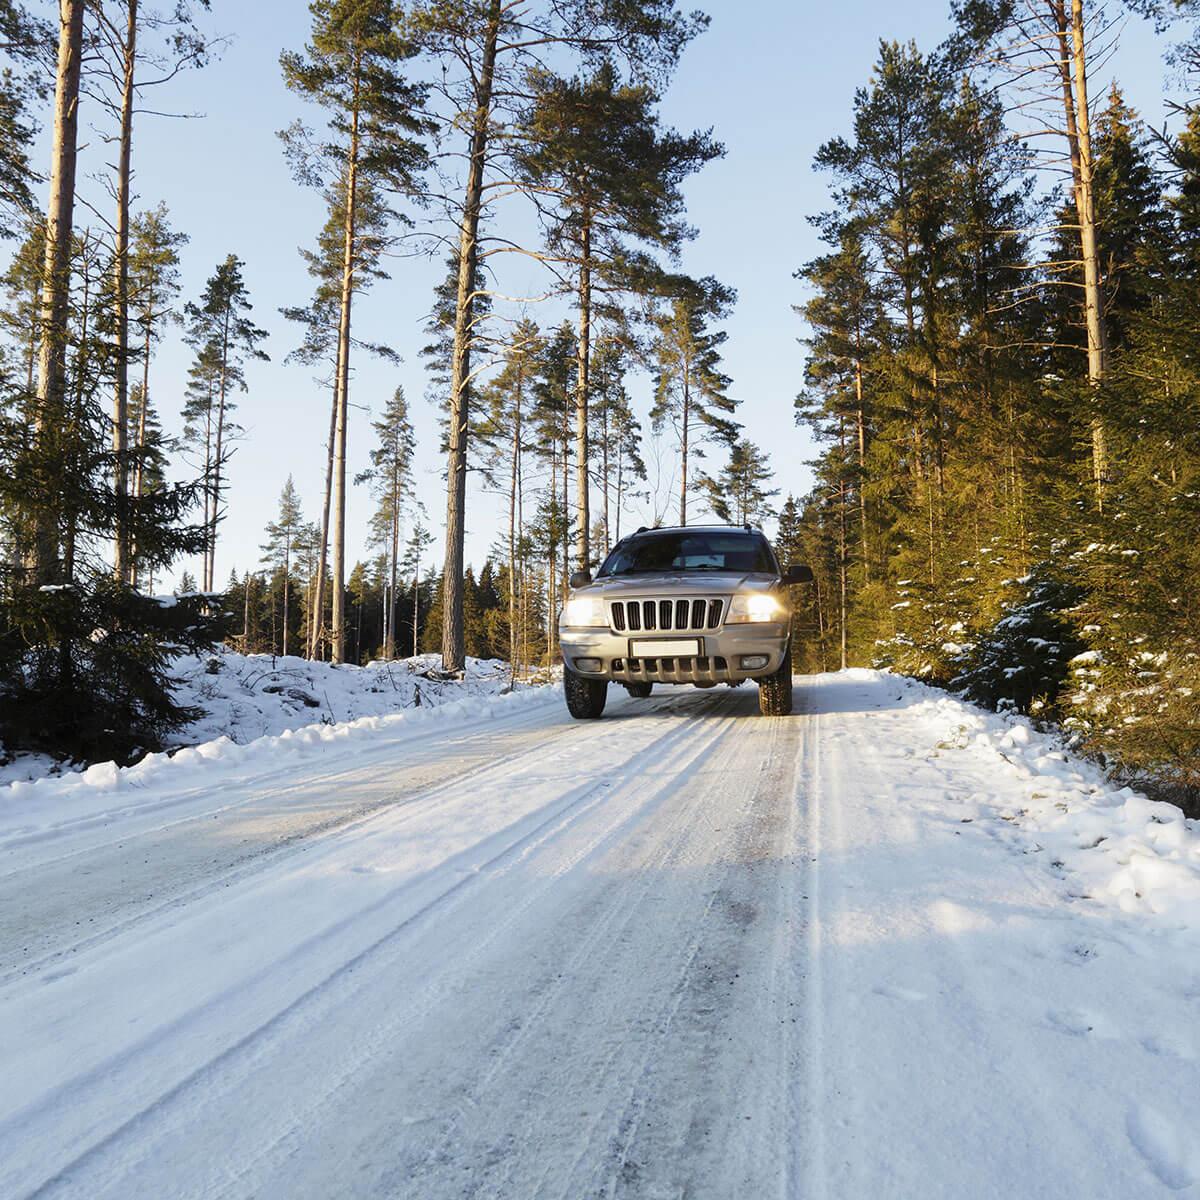 Infocenter Autofahrer Winterkigge